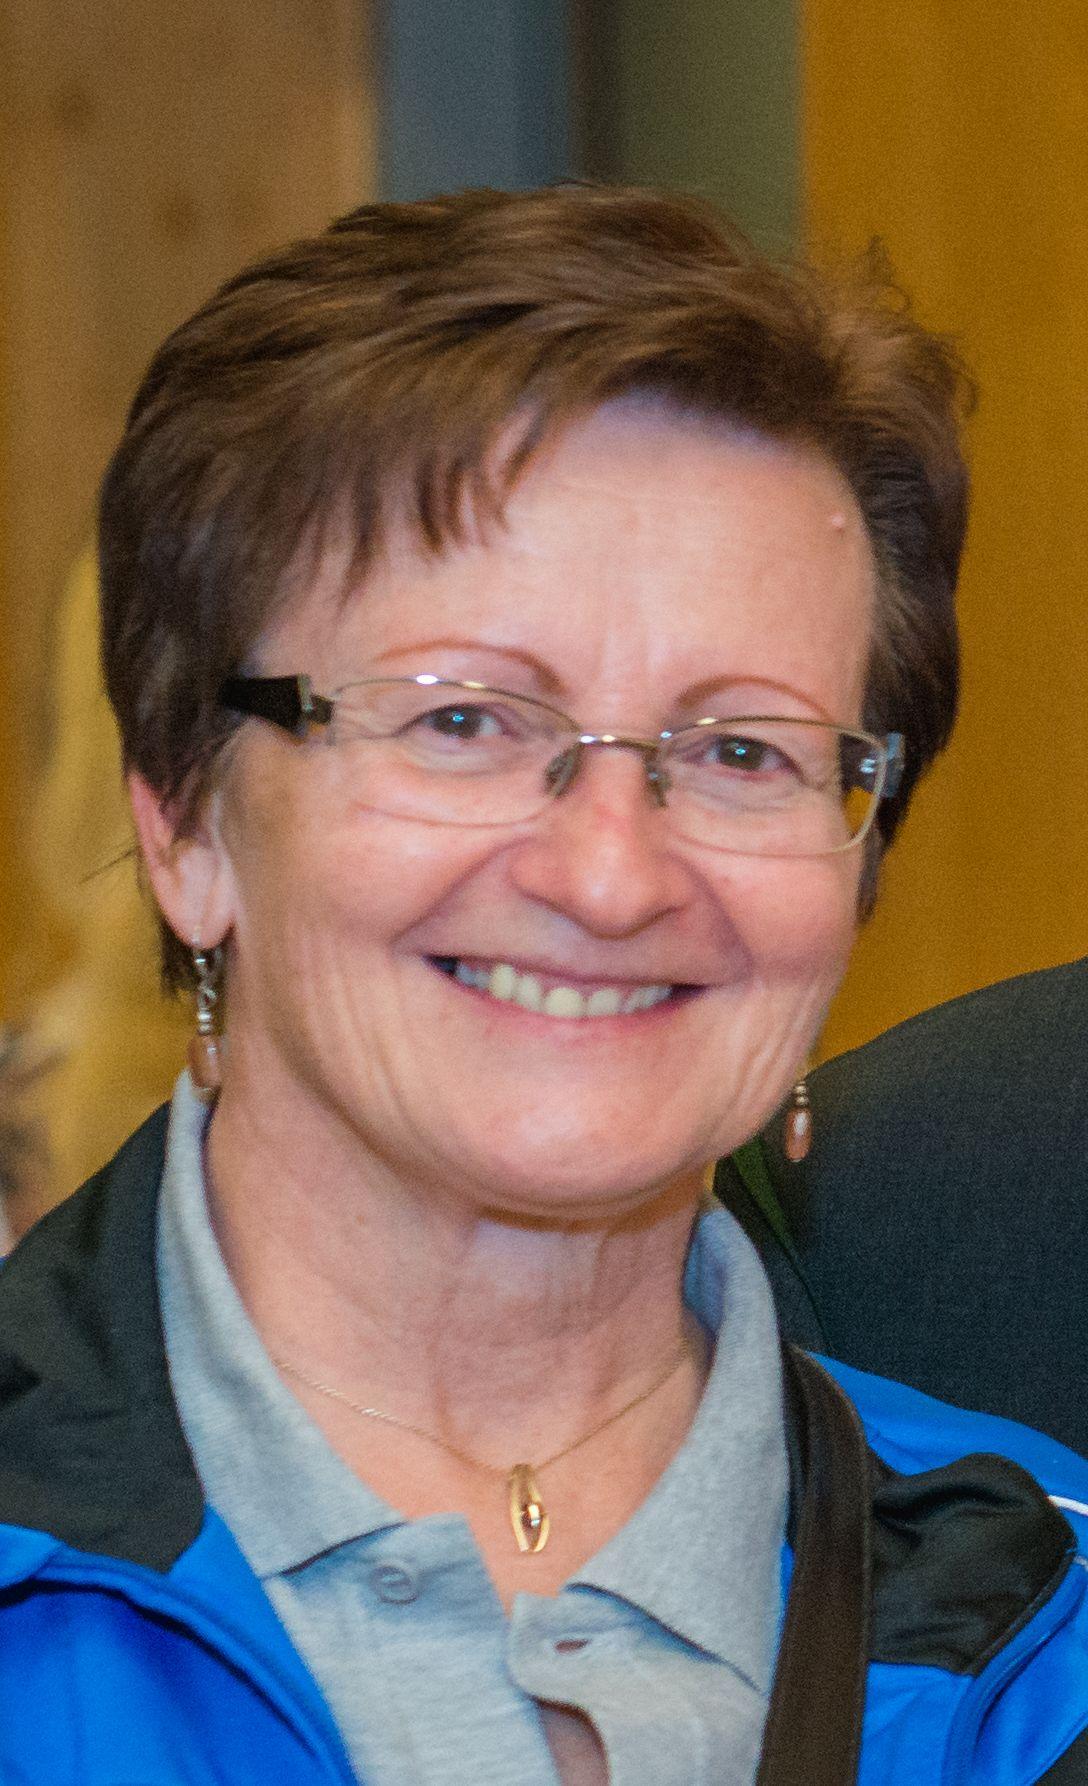 Karina Schmirl